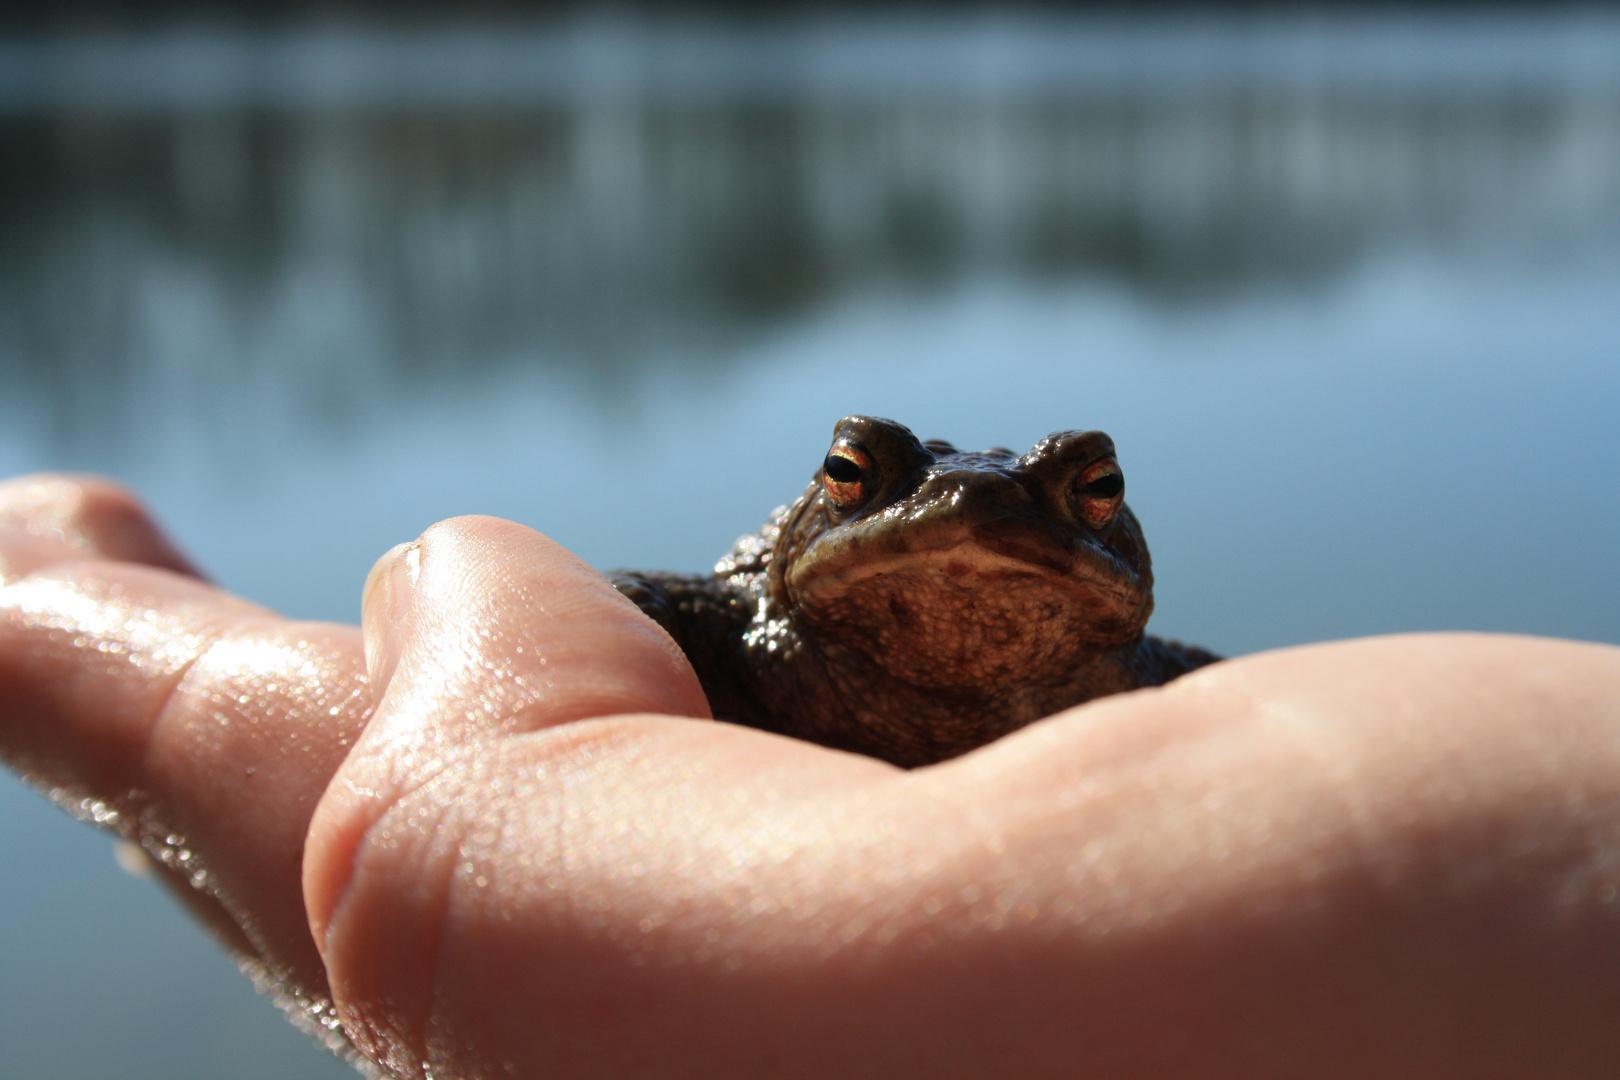 Mr. Frosch